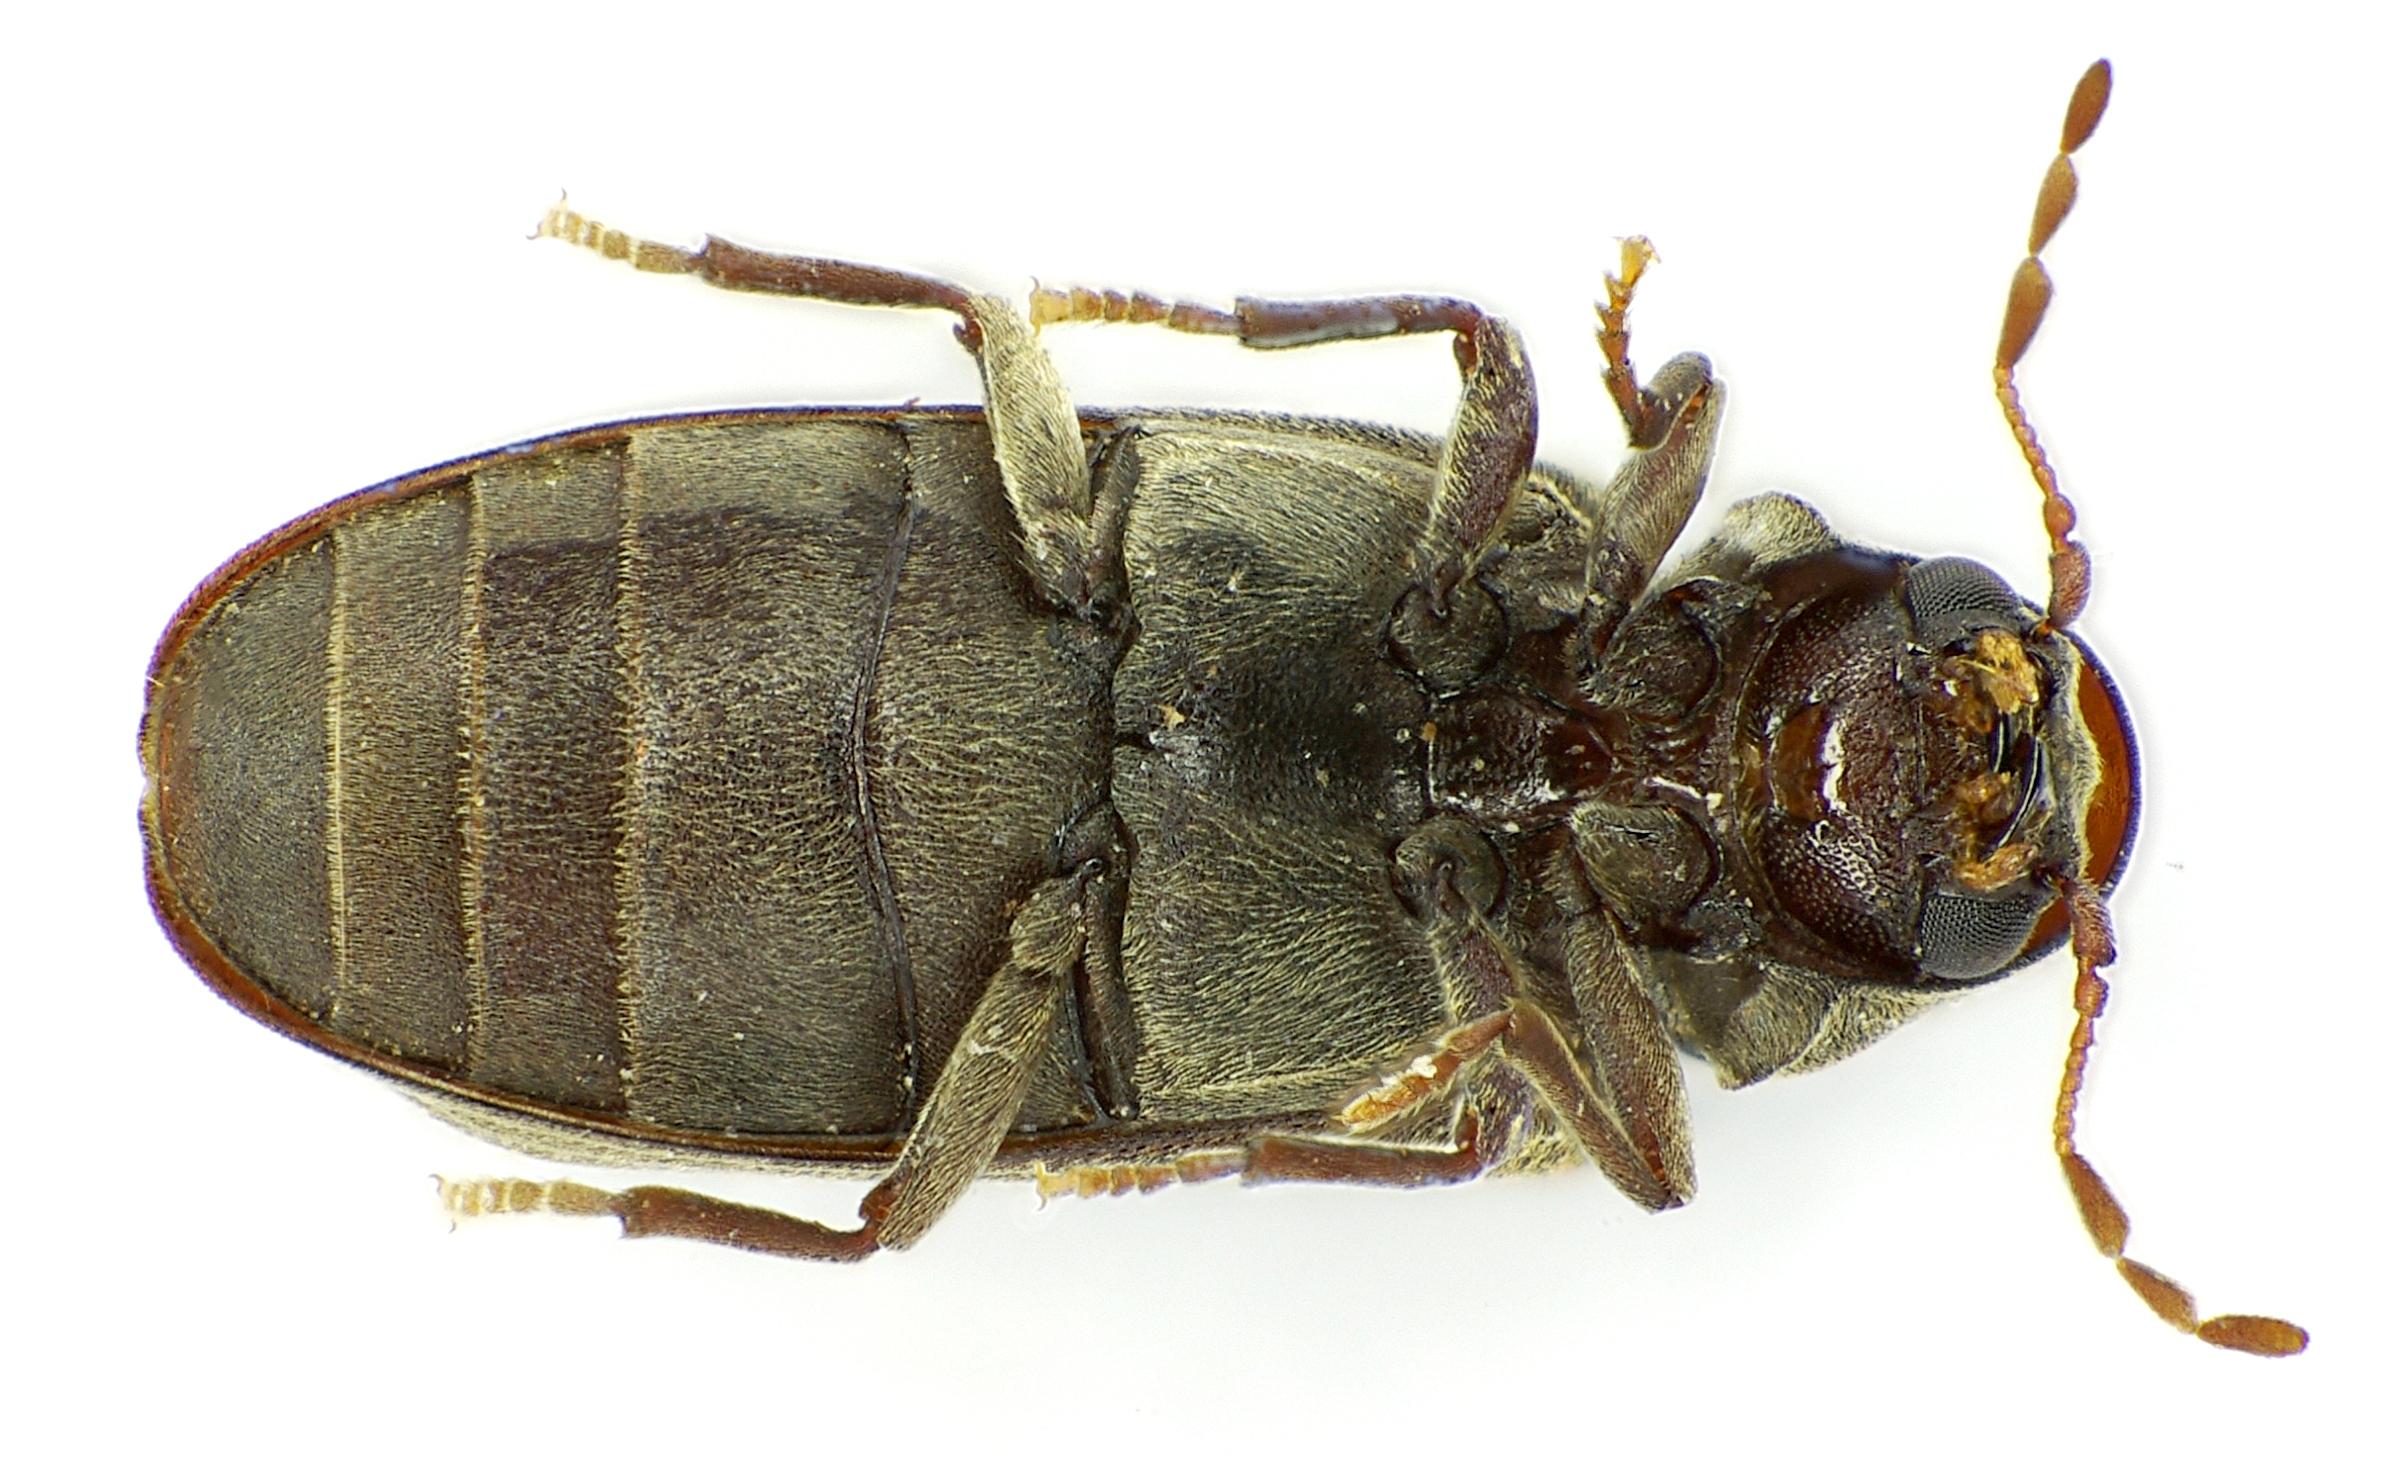 Very Impressive portraiture of Species Anobium punctatum Furniture Beetle BugGuide.Net with #997432 color and 2392x1474 pixels